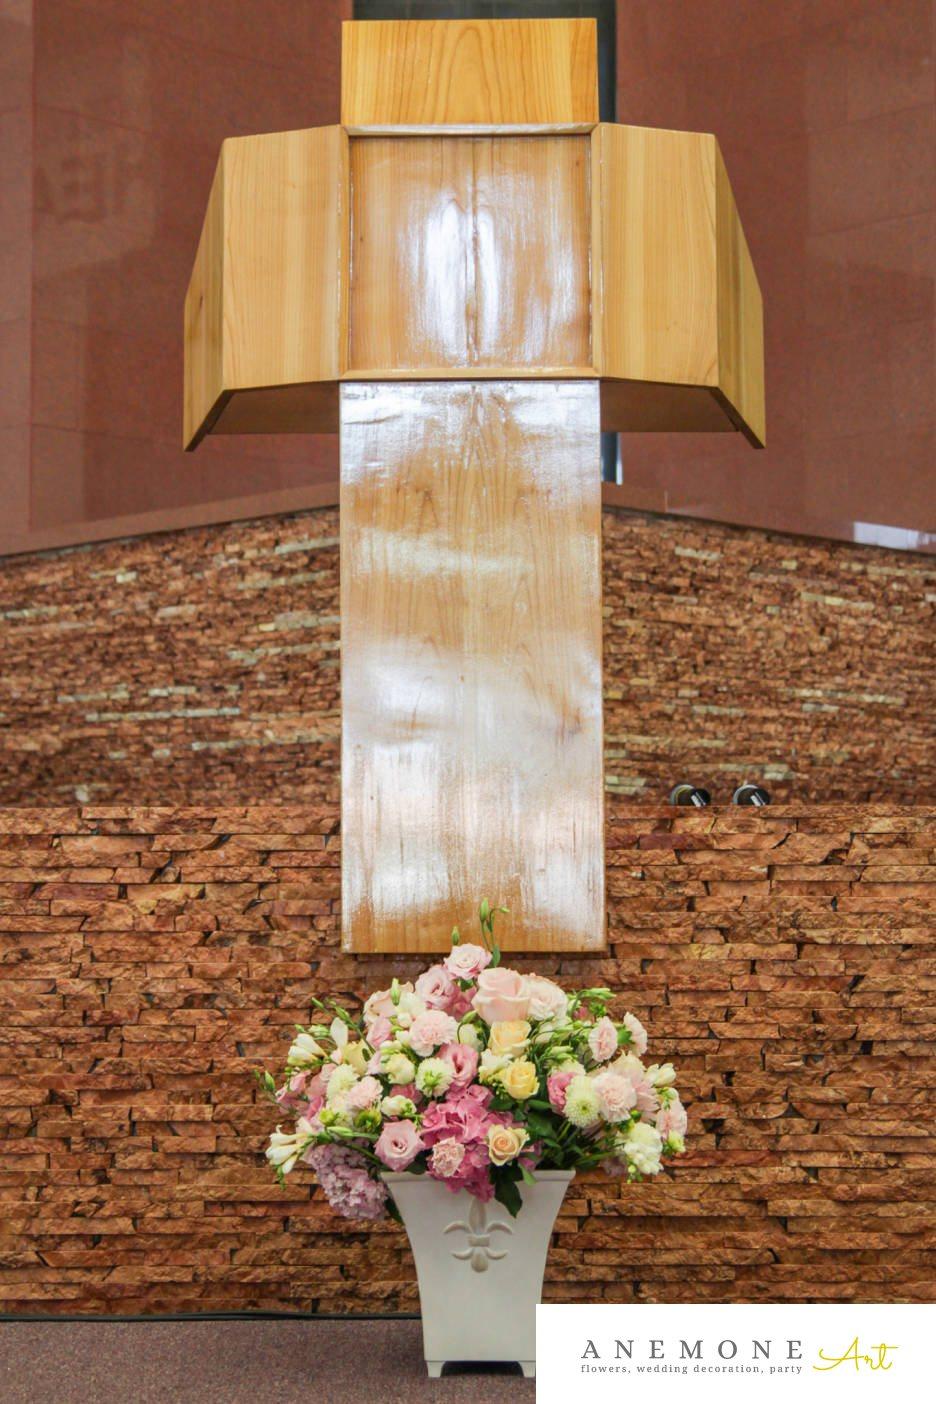 Poza, foto cu Flori de nunta alb, dalia, hortensia, roz, trandafiri, vaza in Arad, Timisoara, Oradea (wedding flowers, bouquets) nunta Arad, Timisoara, Oradea